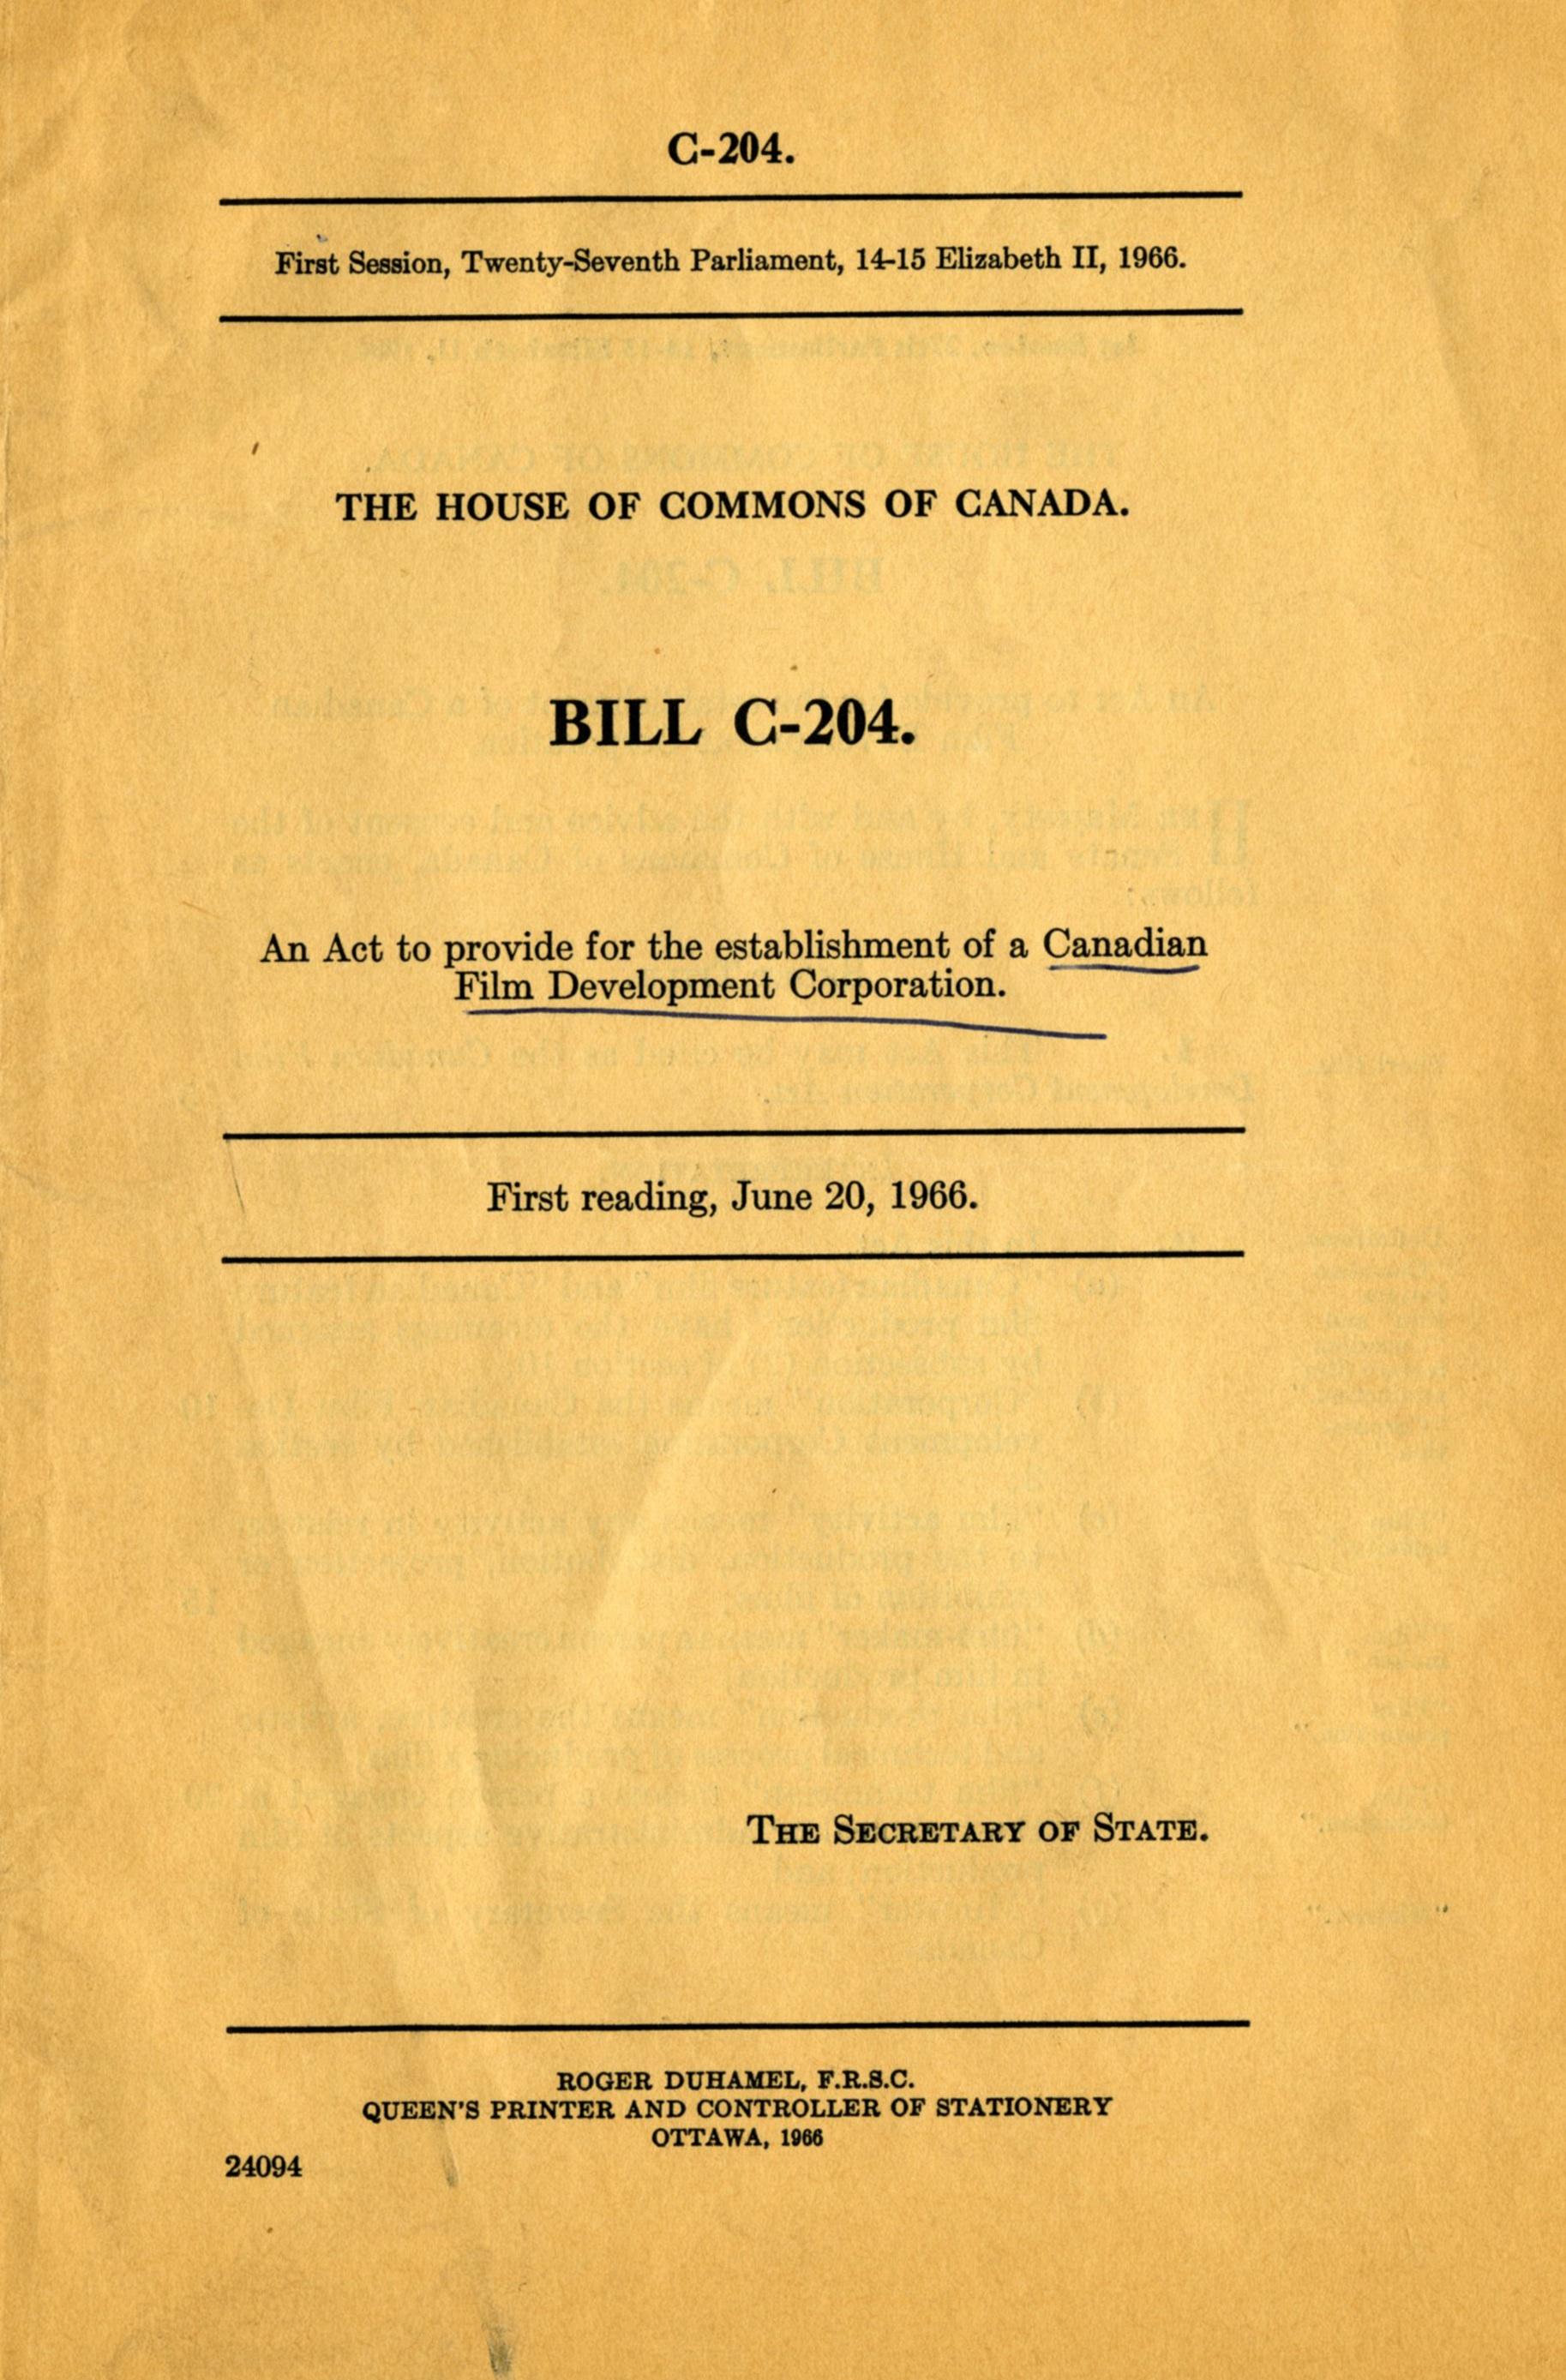 The White Paper for the establishment of the Canadian Film Development Corporation